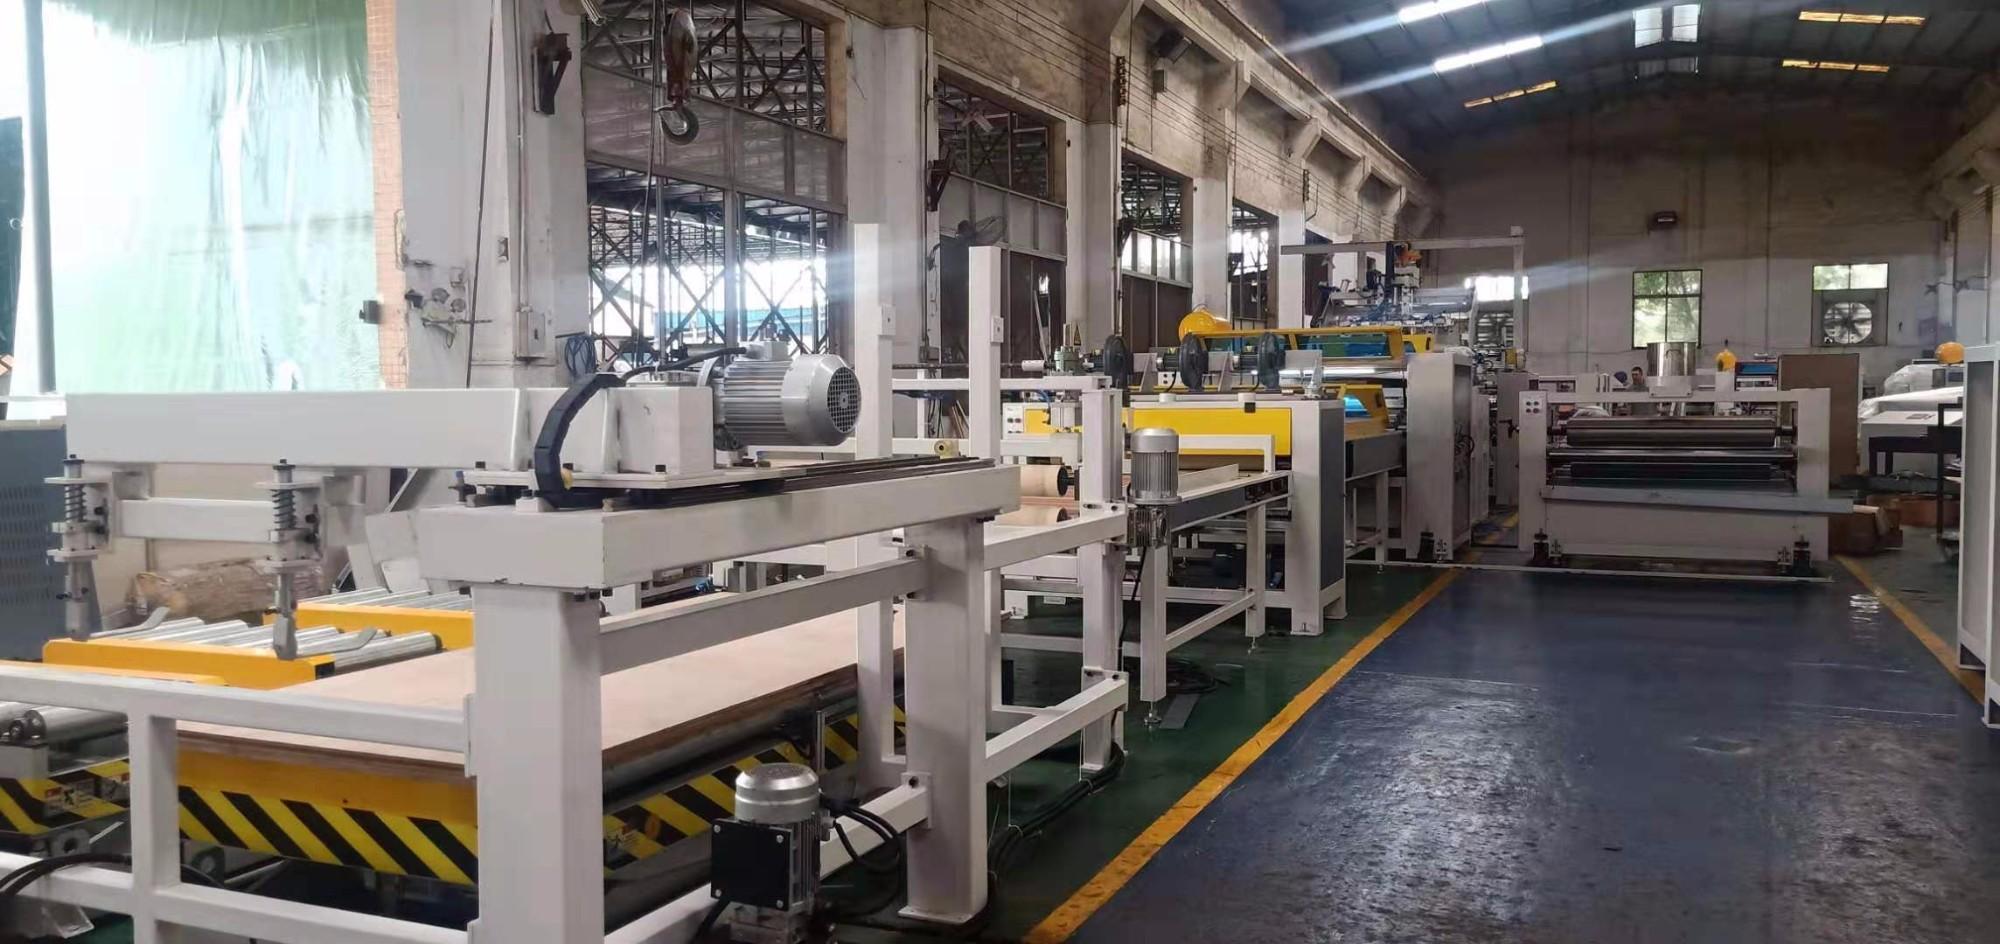 Auto Panel Infeeding Device Manufacturers, Auto Panel Infeeding Device Factory, Supply Auto Panel Infeeding Device